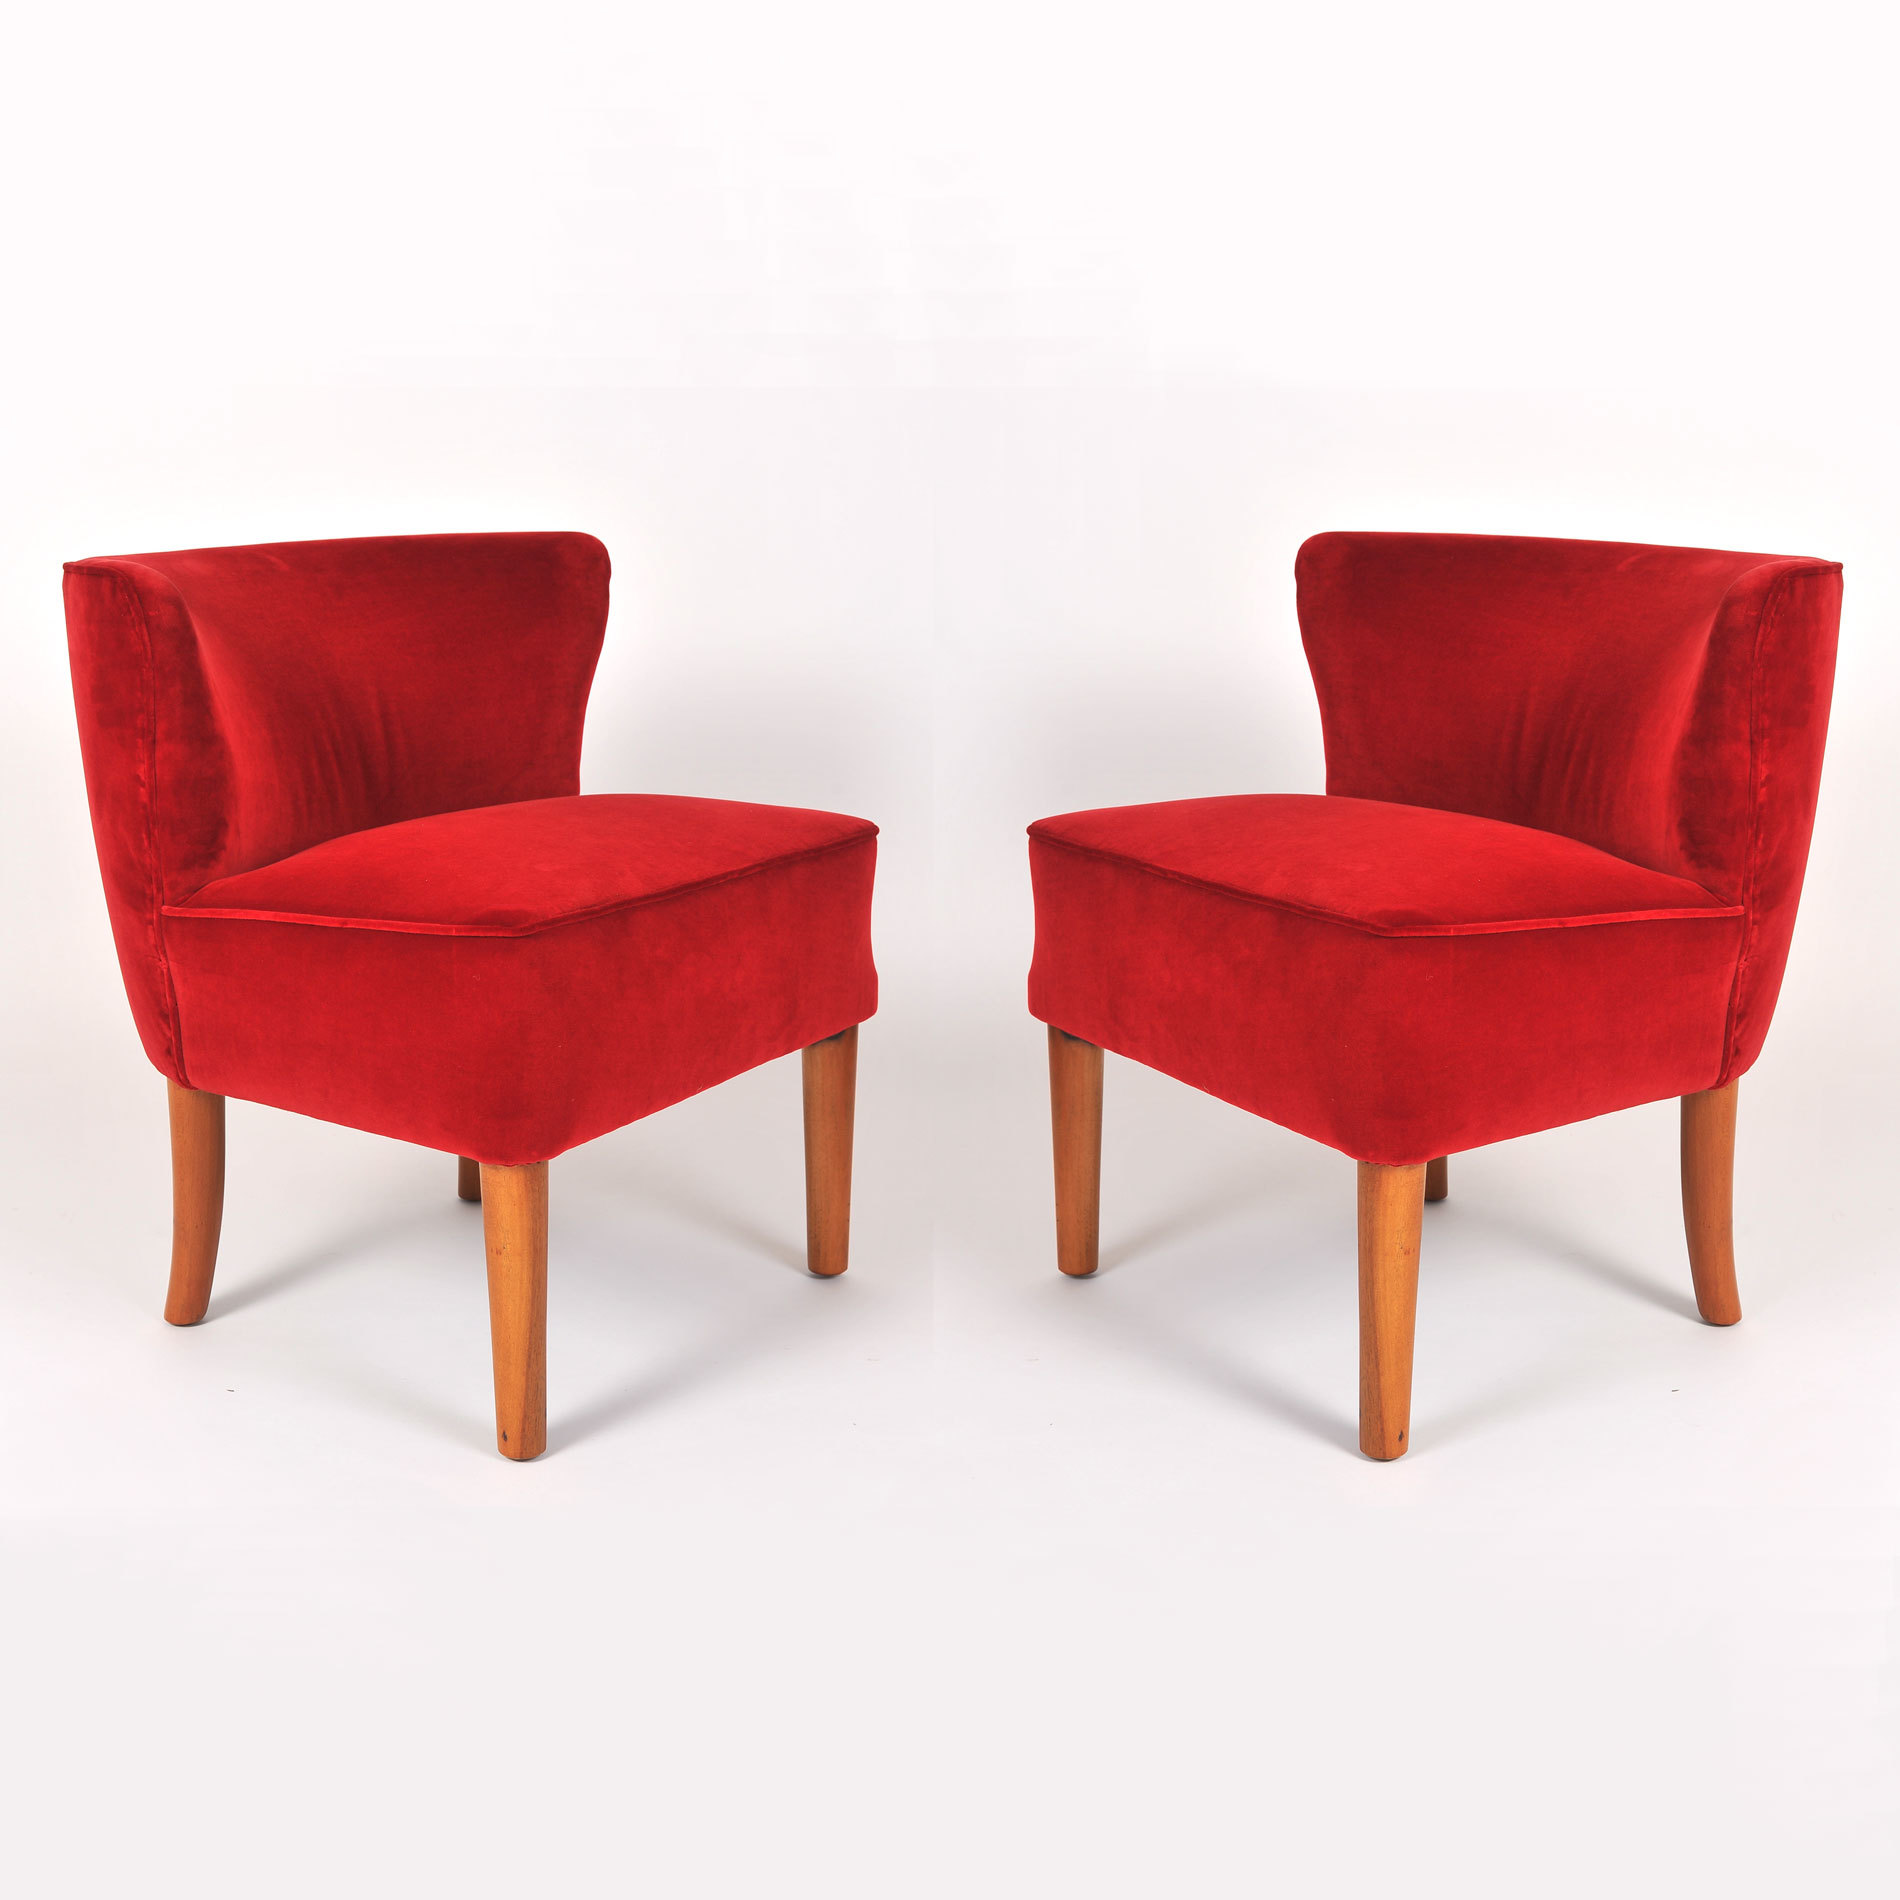 Pair Red Velvet Chairs 01